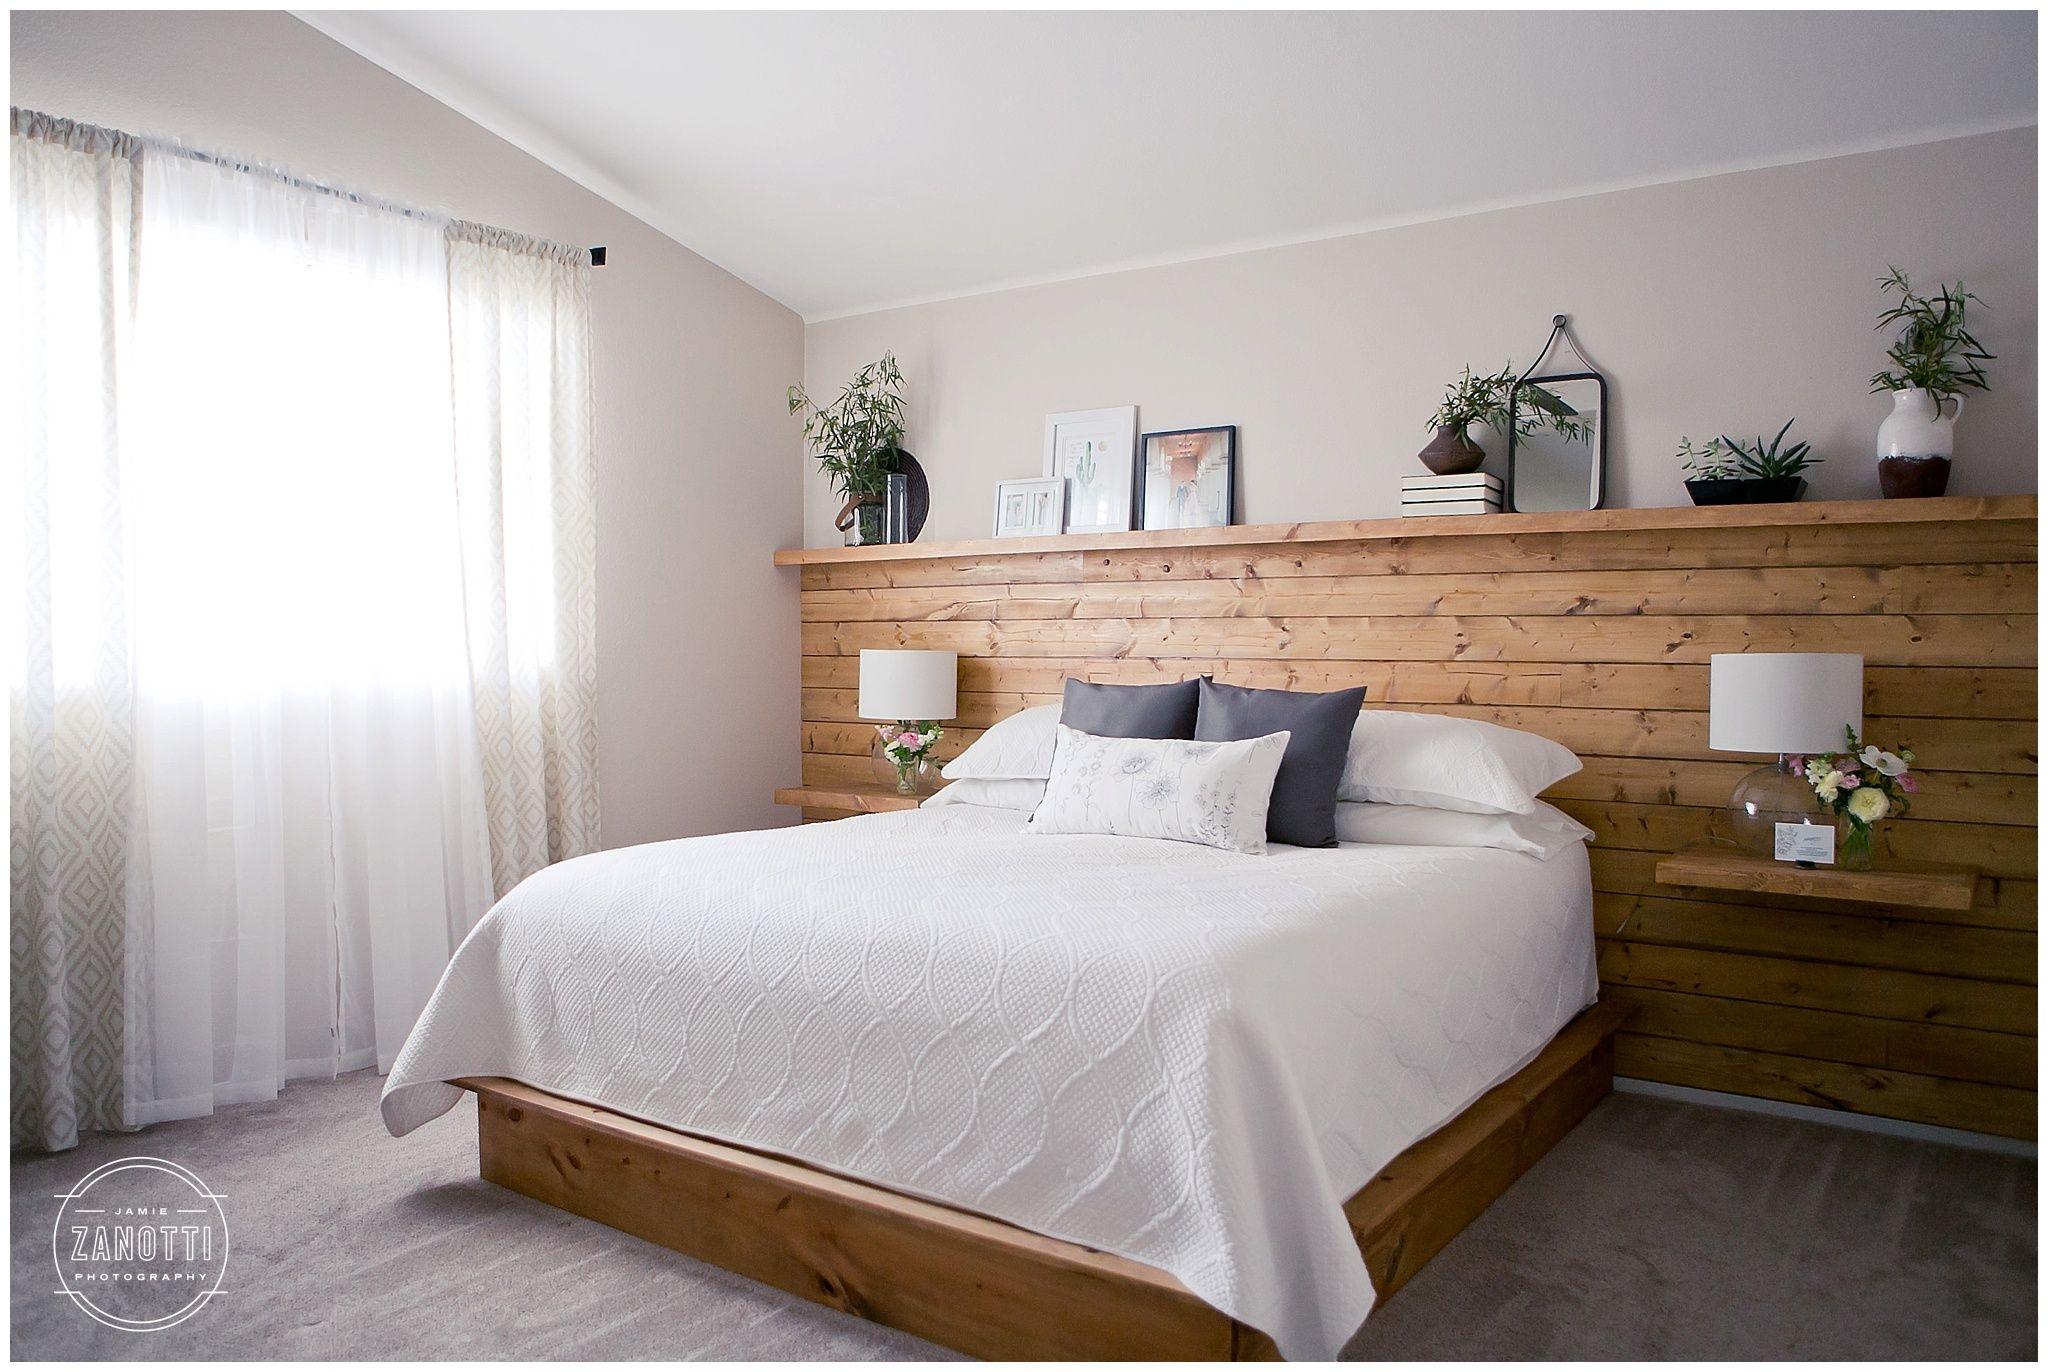 Diy natural wood shiplap tongueandgroove headboard wall